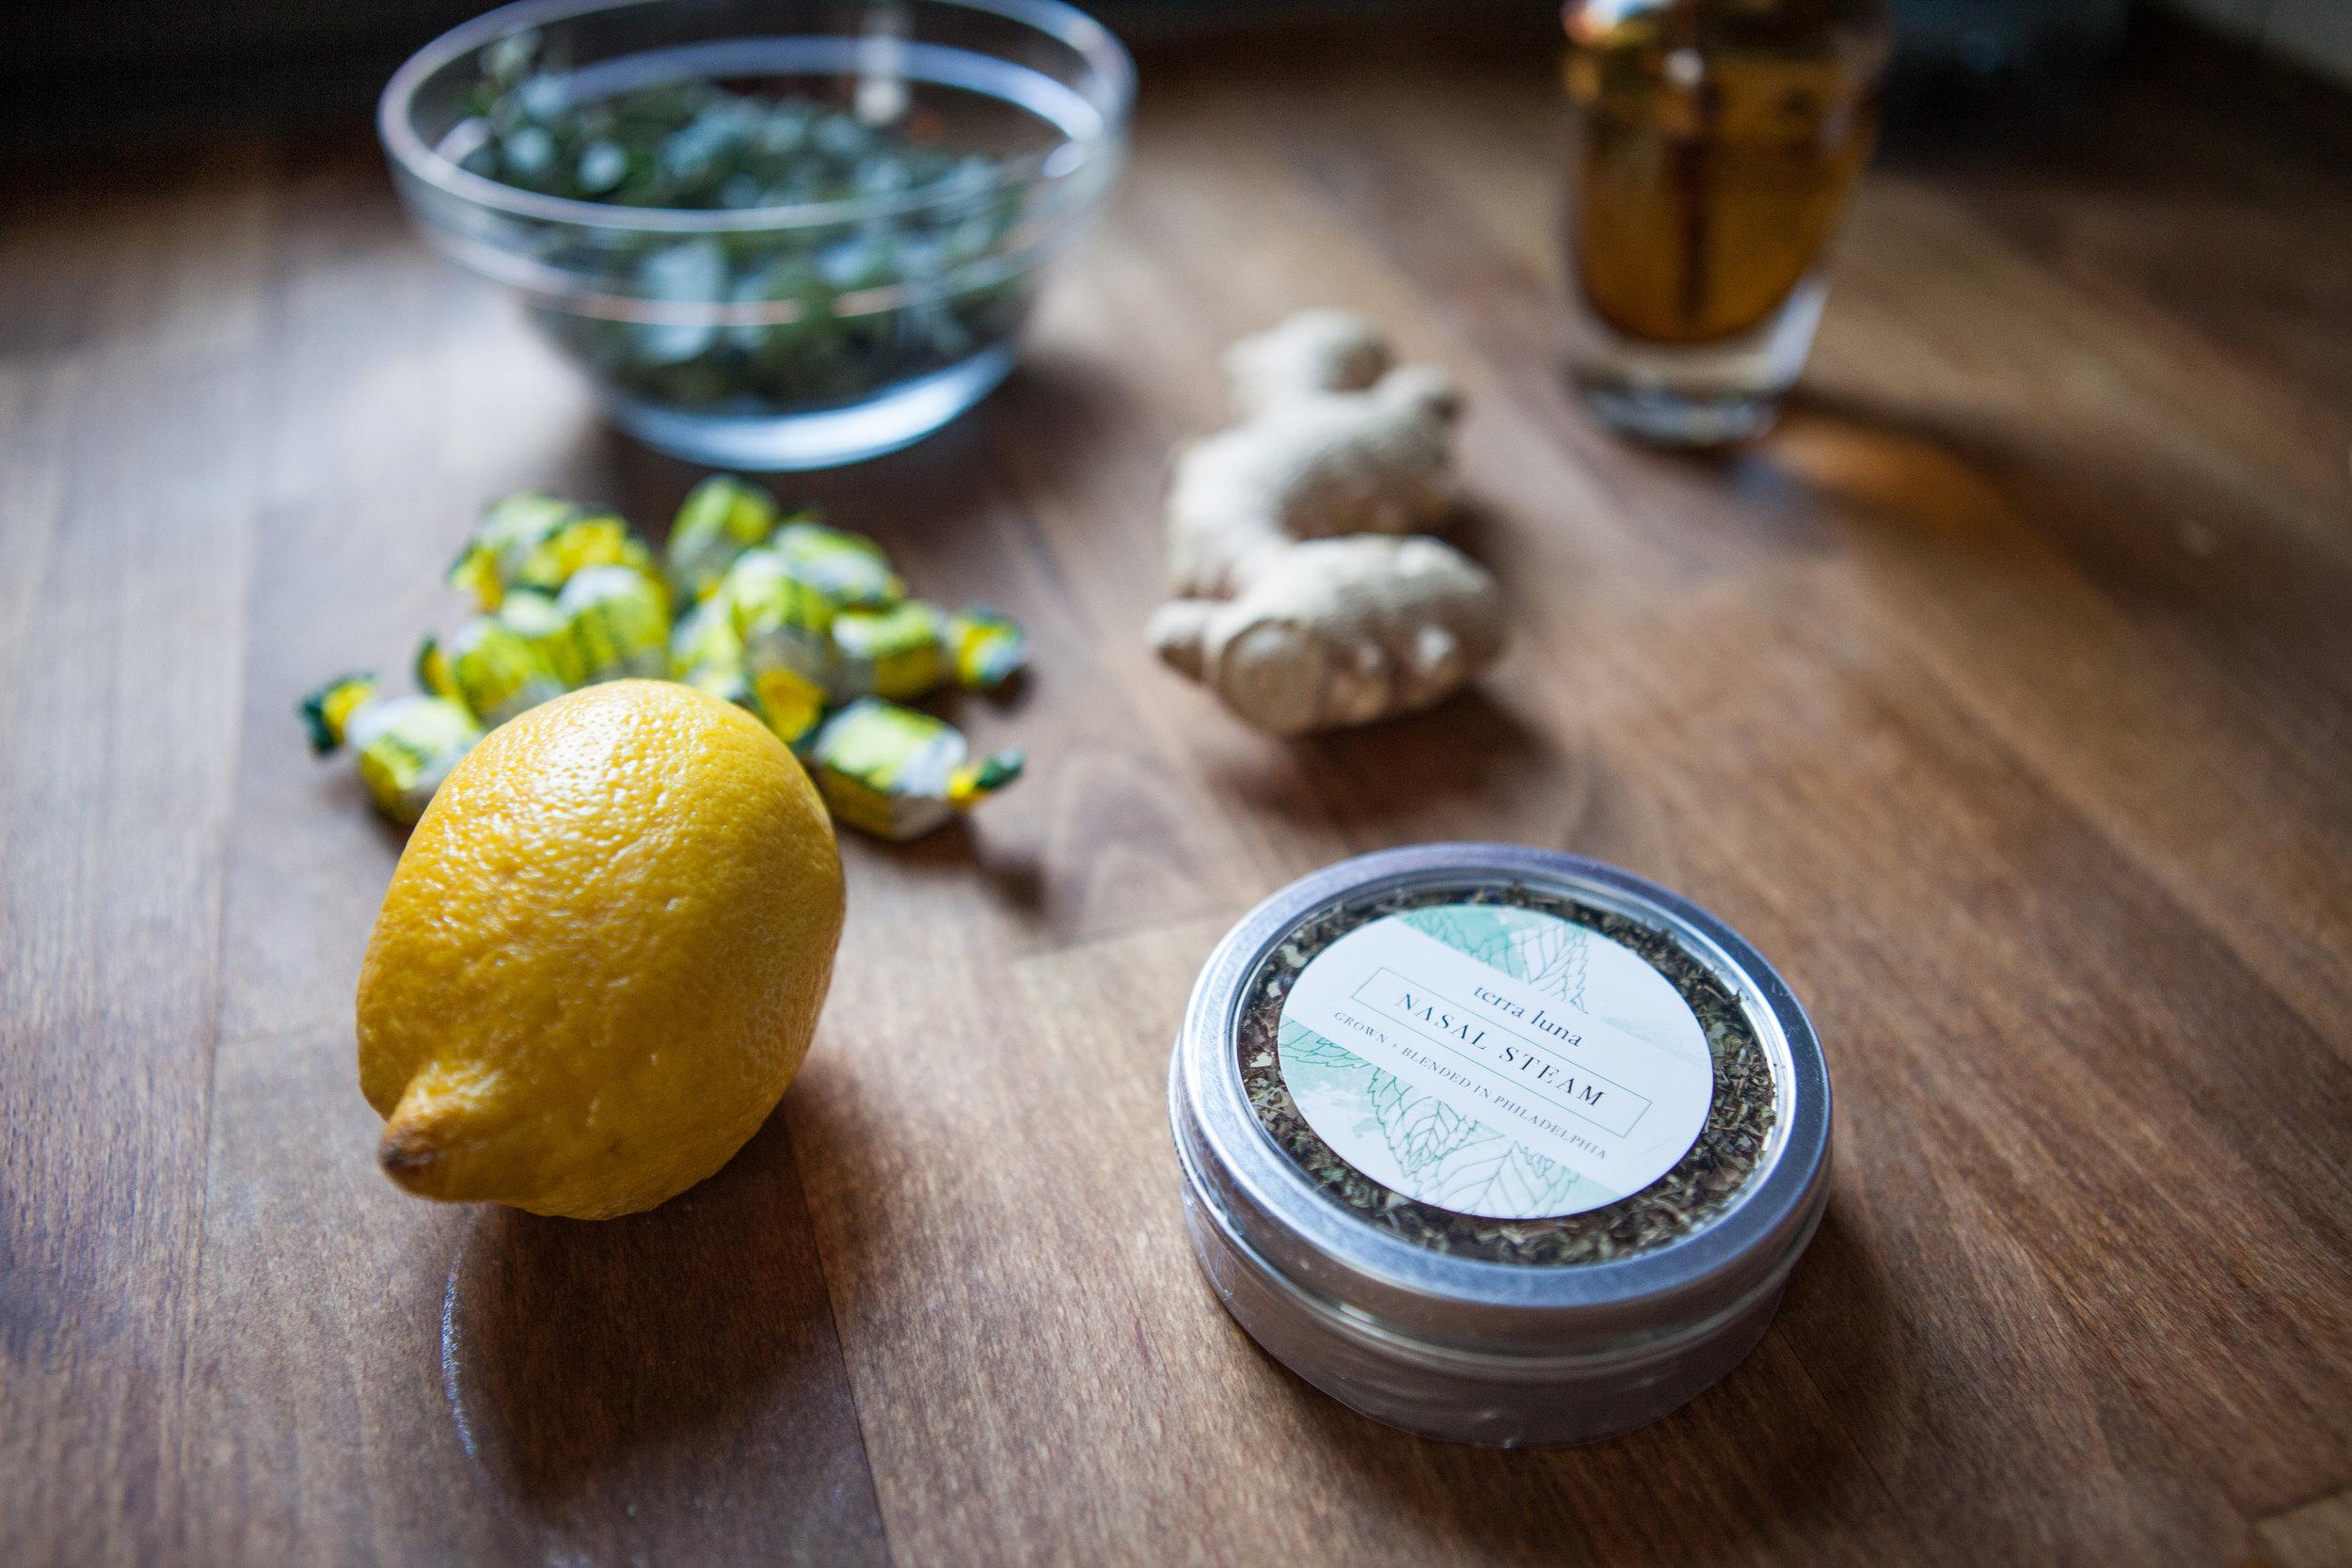 nasal-steam-cold-remedy-herbal-terra-luna.jpg